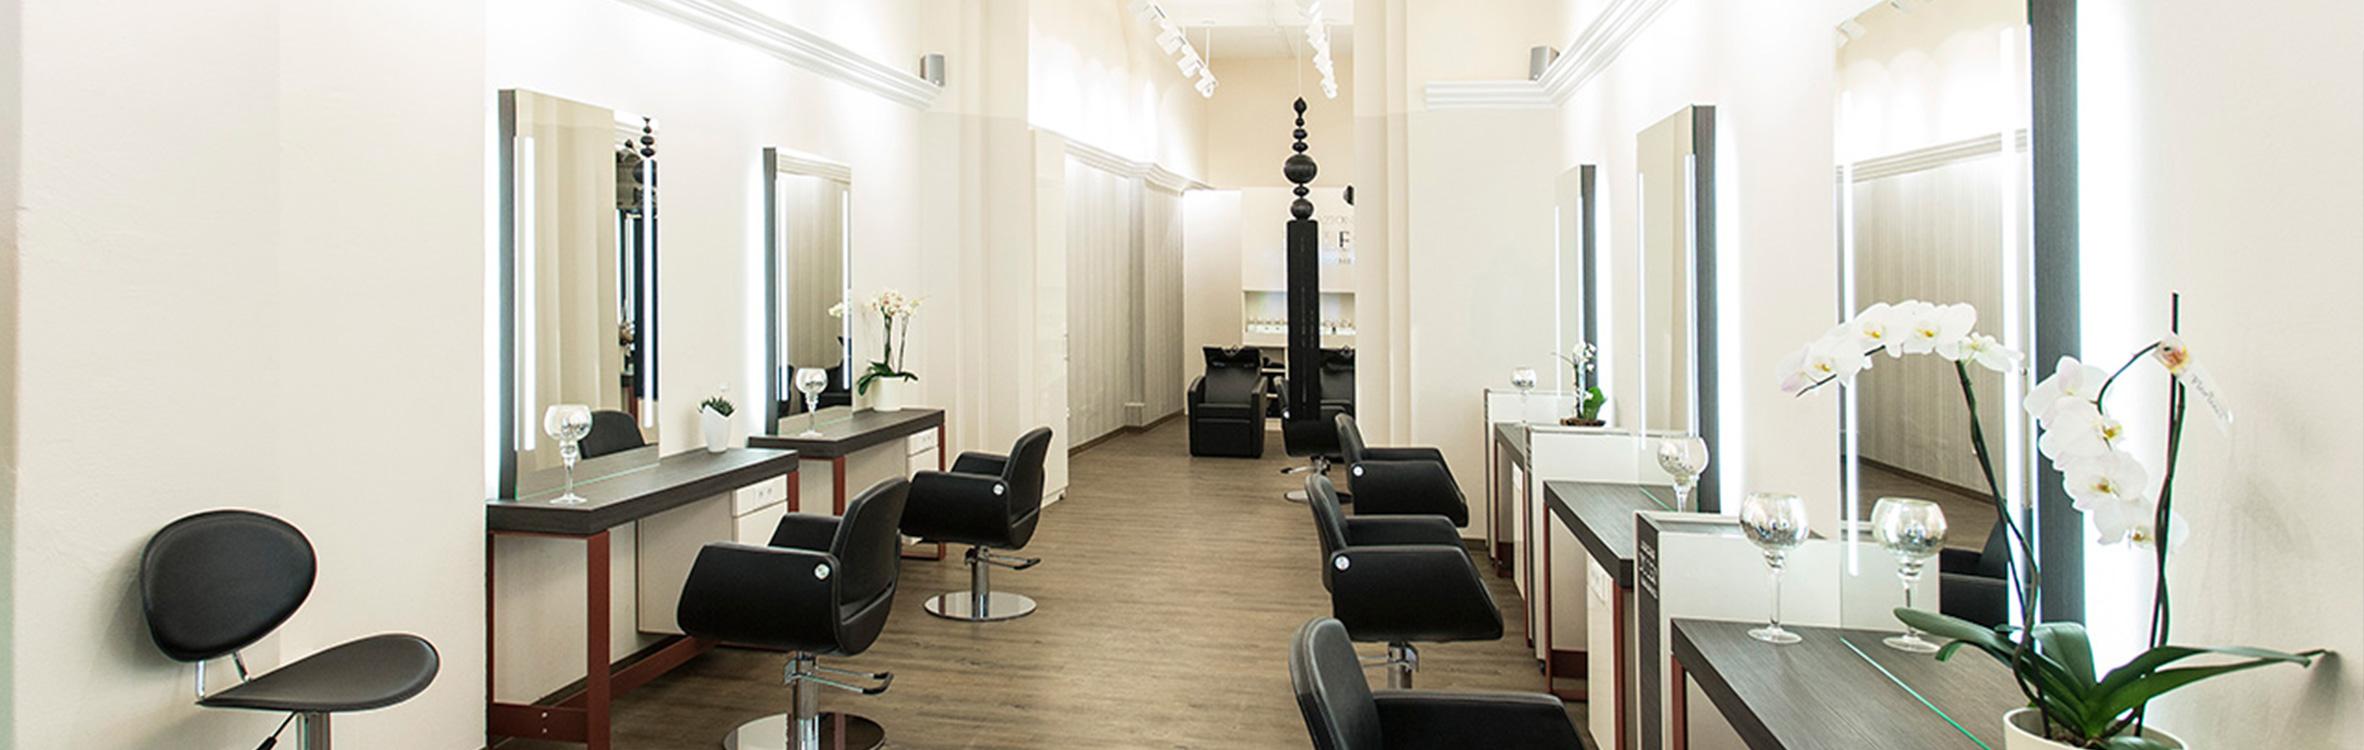 Creazione Di Leo - Friseur-Salon